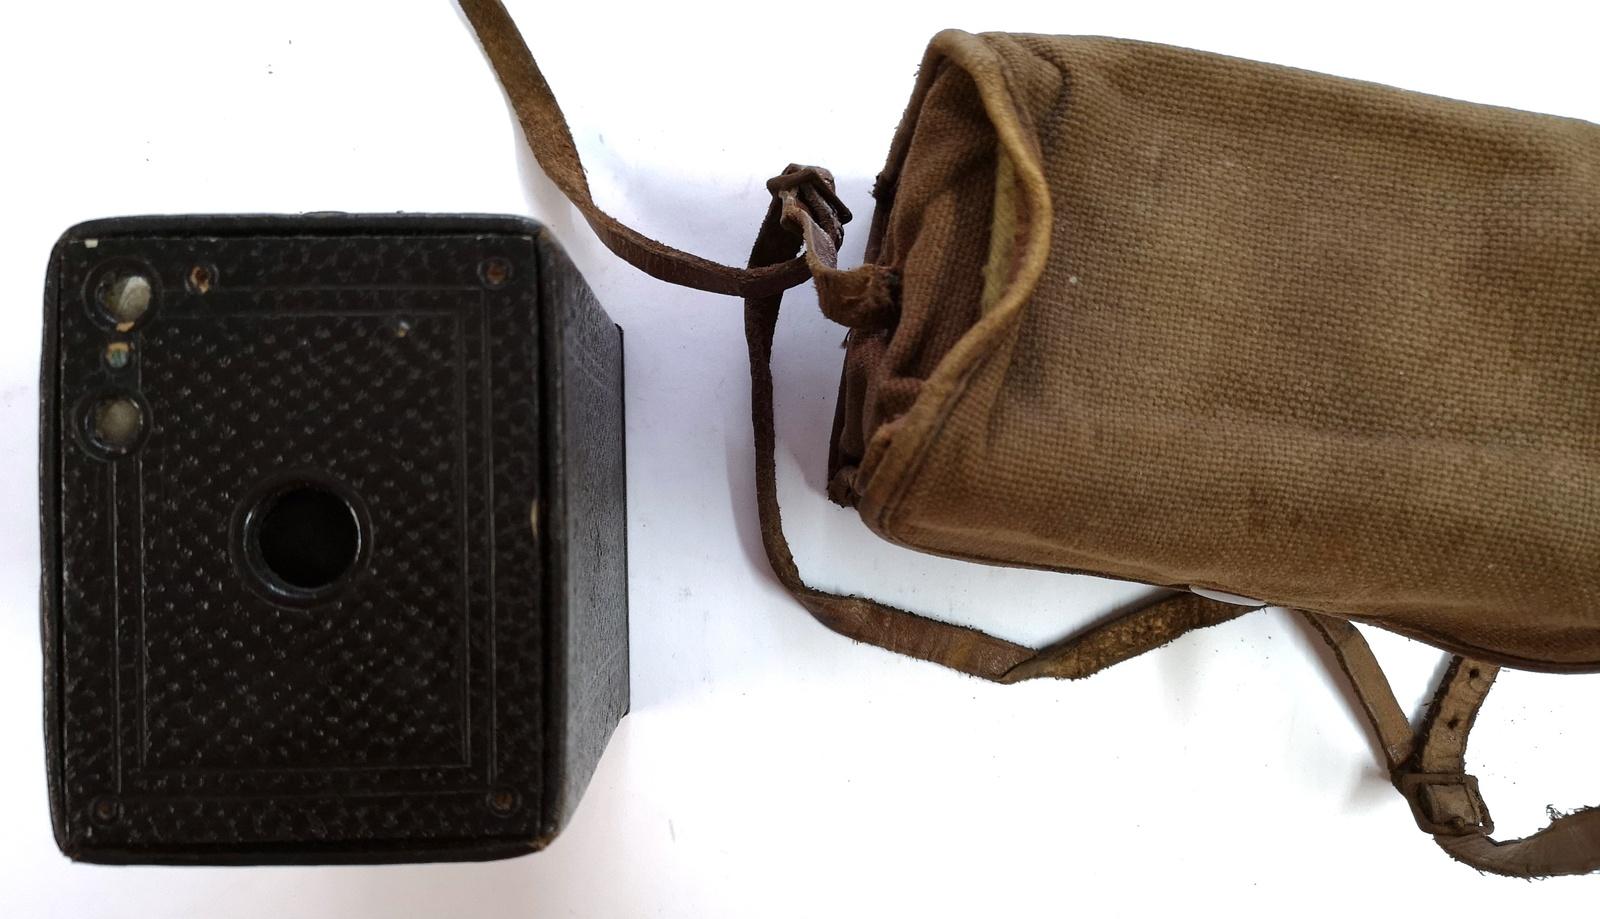 Kodak Eastman: Brownie No.2A Model B (Canada), with Bag  - Camera (2) - $10.00